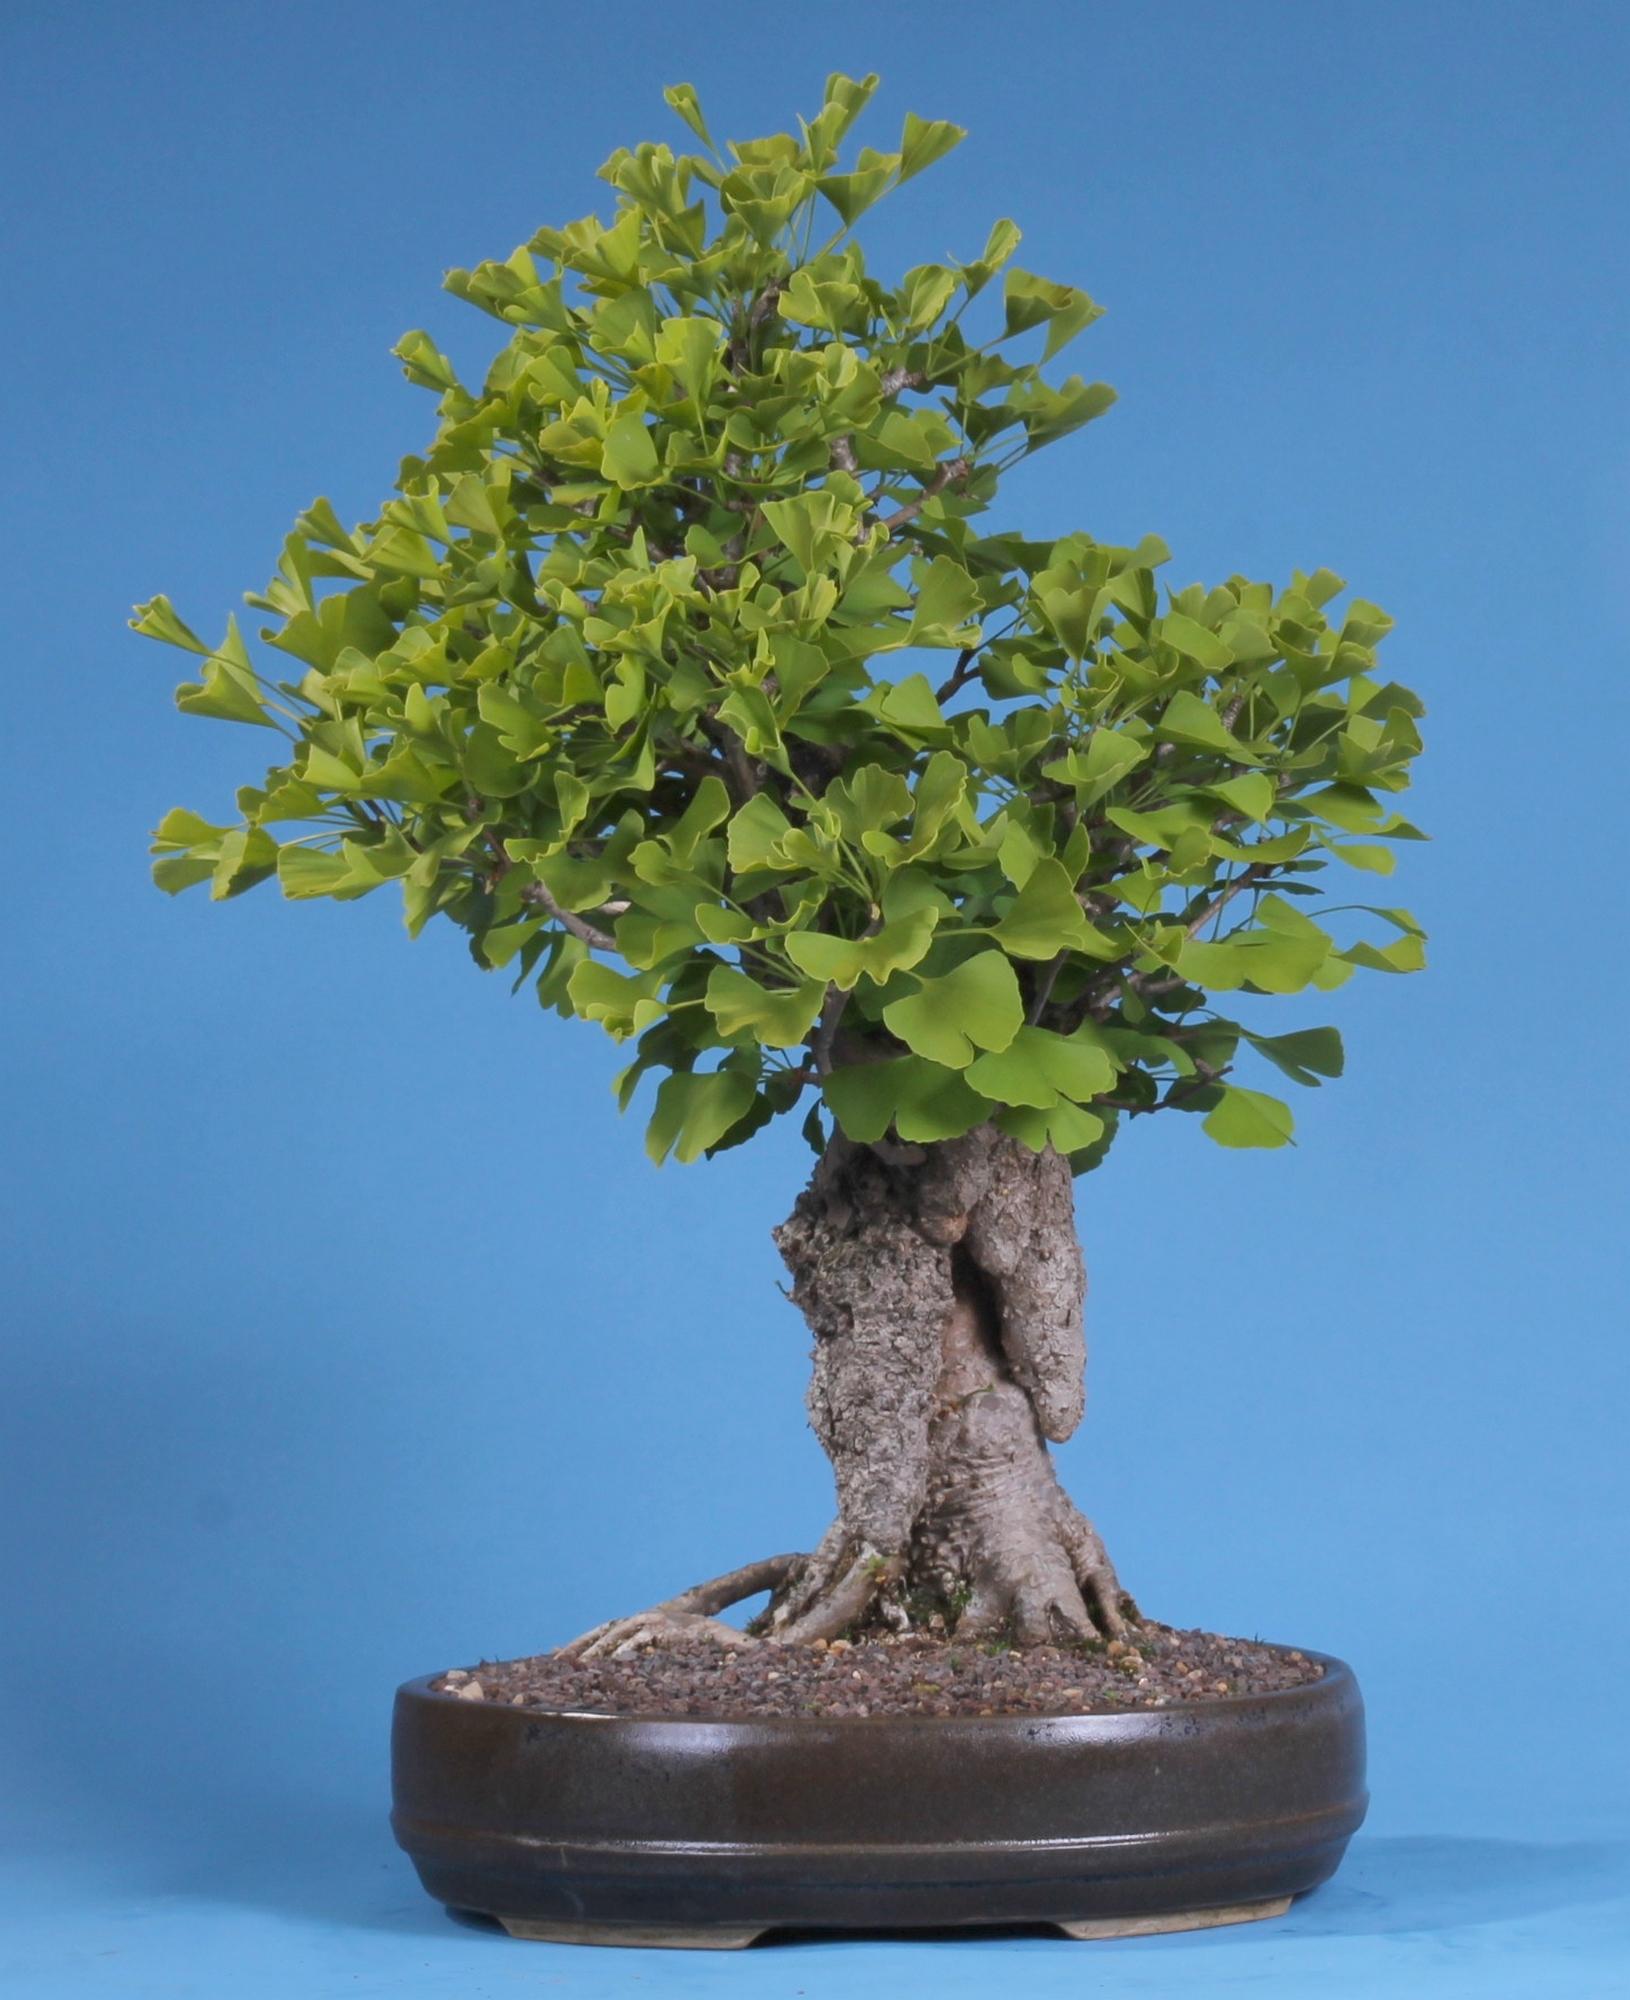 bonsai pflege ginkgo biloba ginkgo. Black Bedroom Furniture Sets. Home Design Ideas